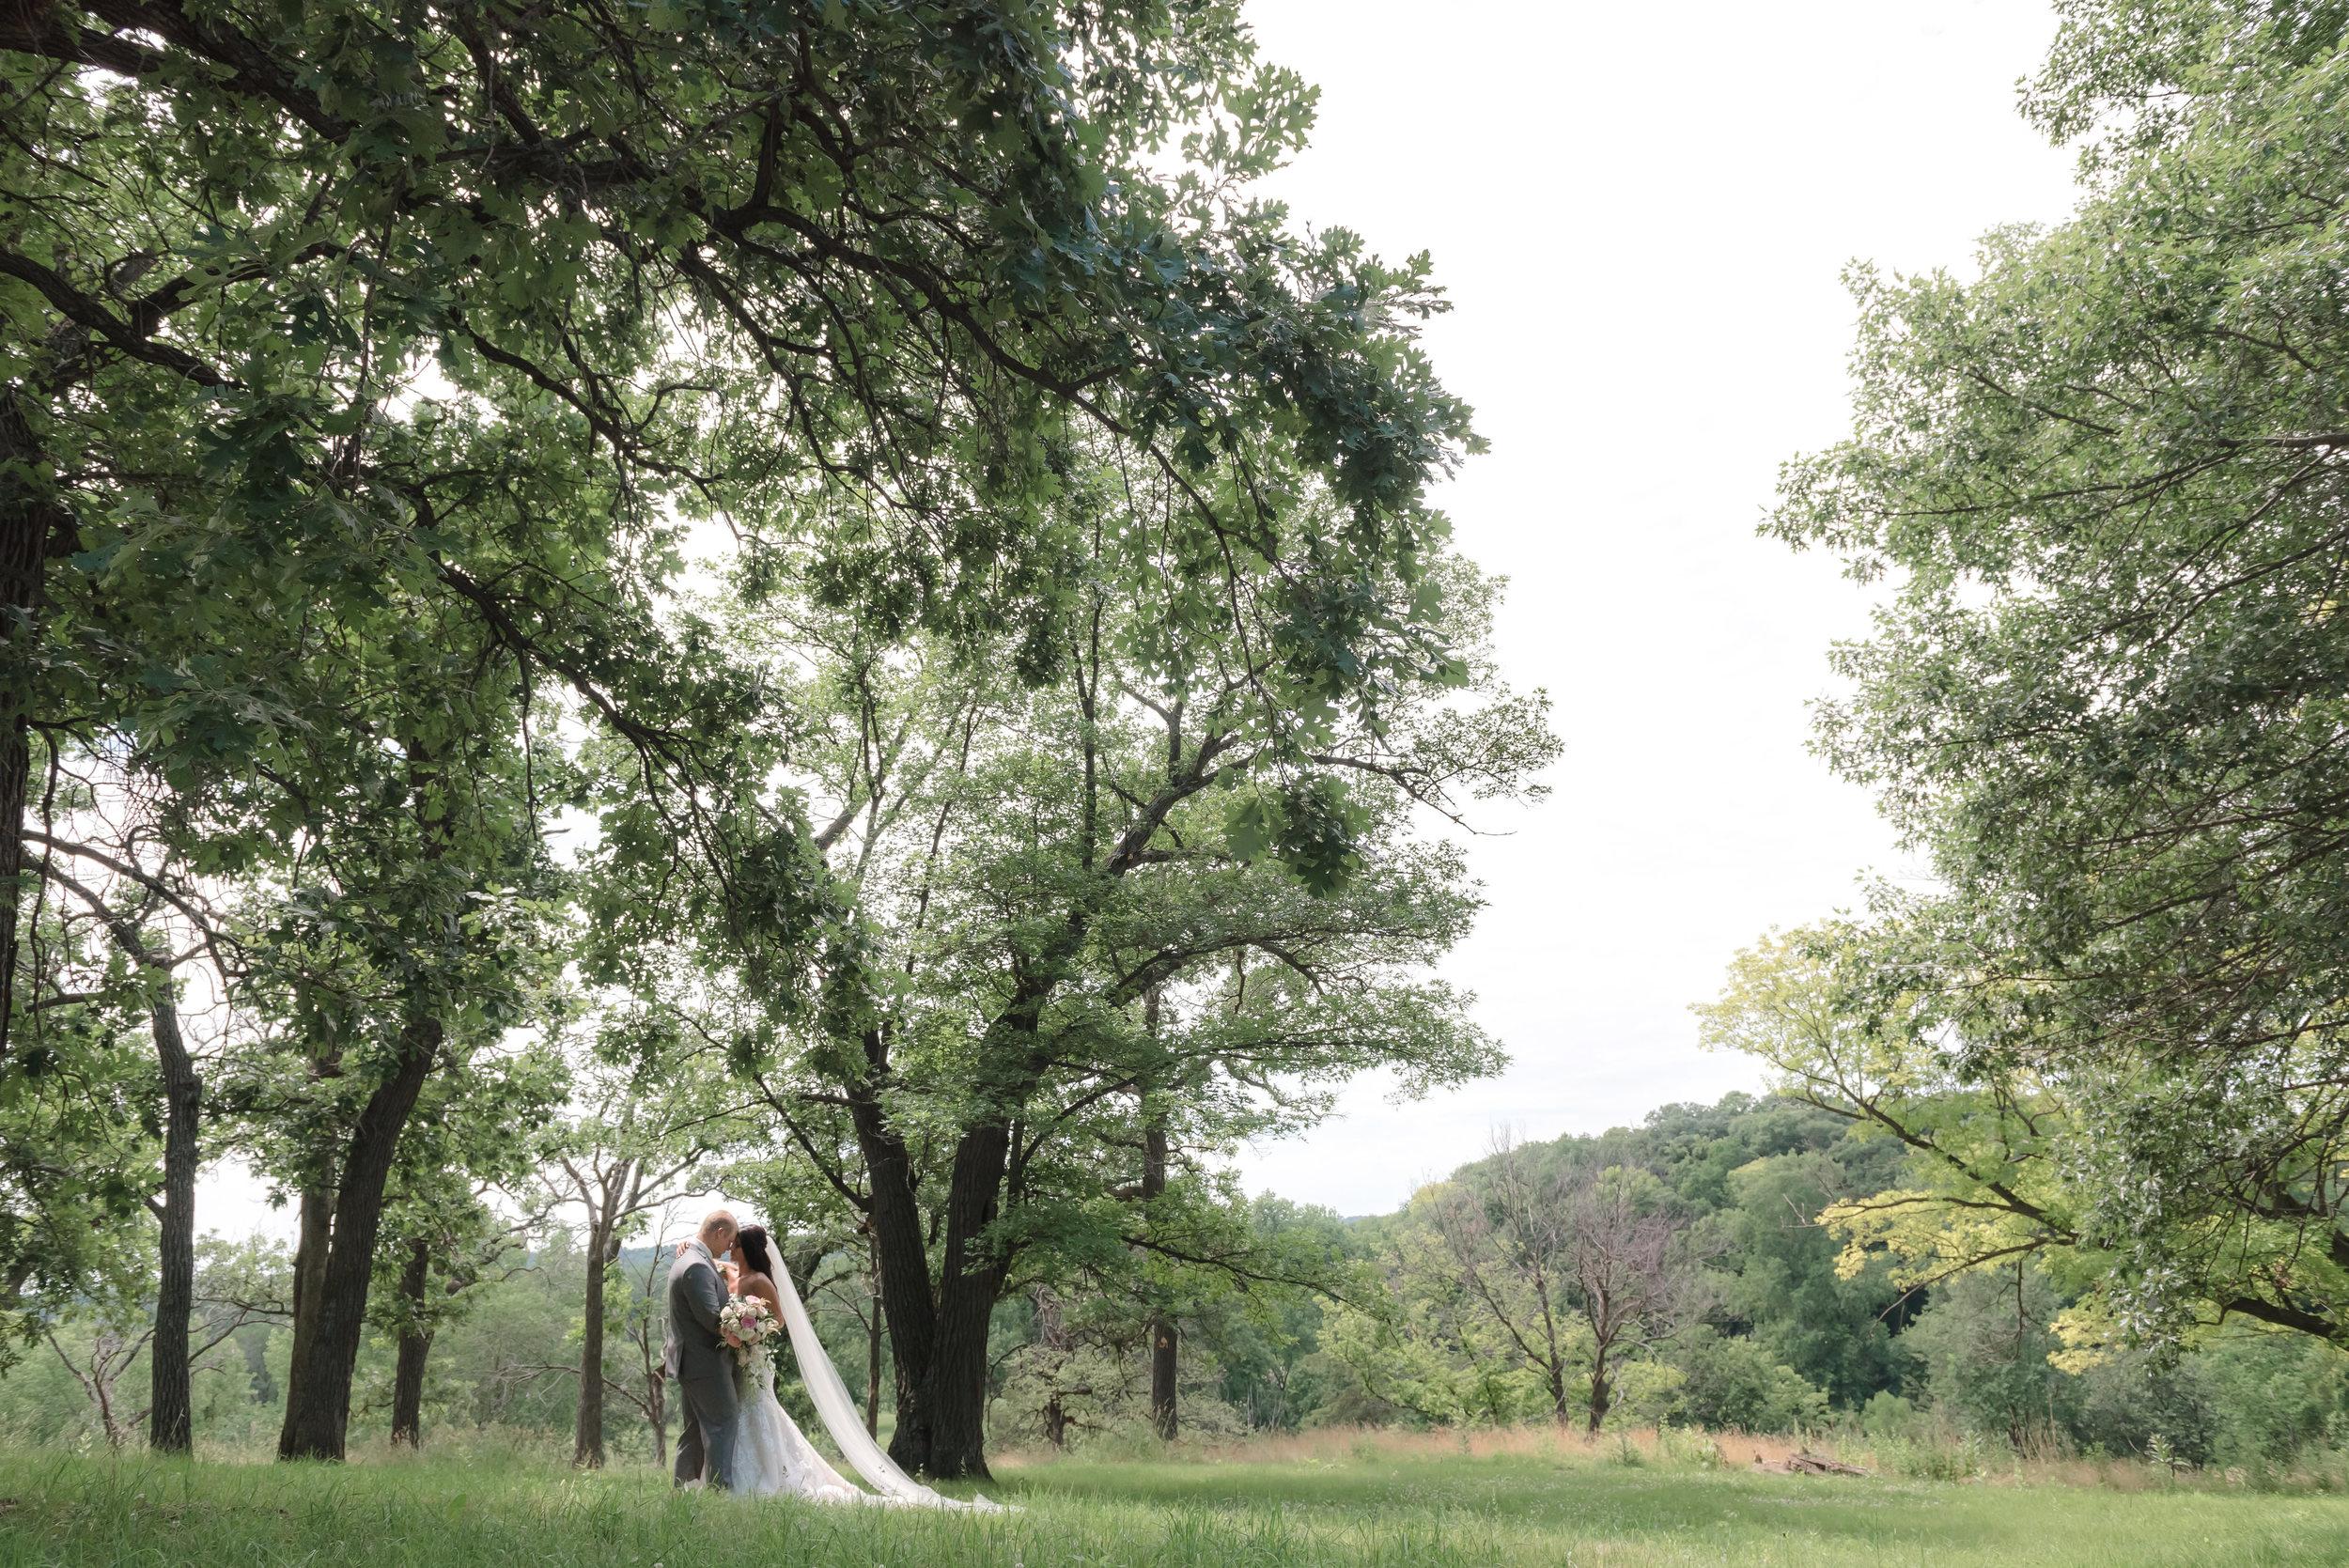 Layce and Brandon - Wedding - Outdoor Portraits-126.jpg